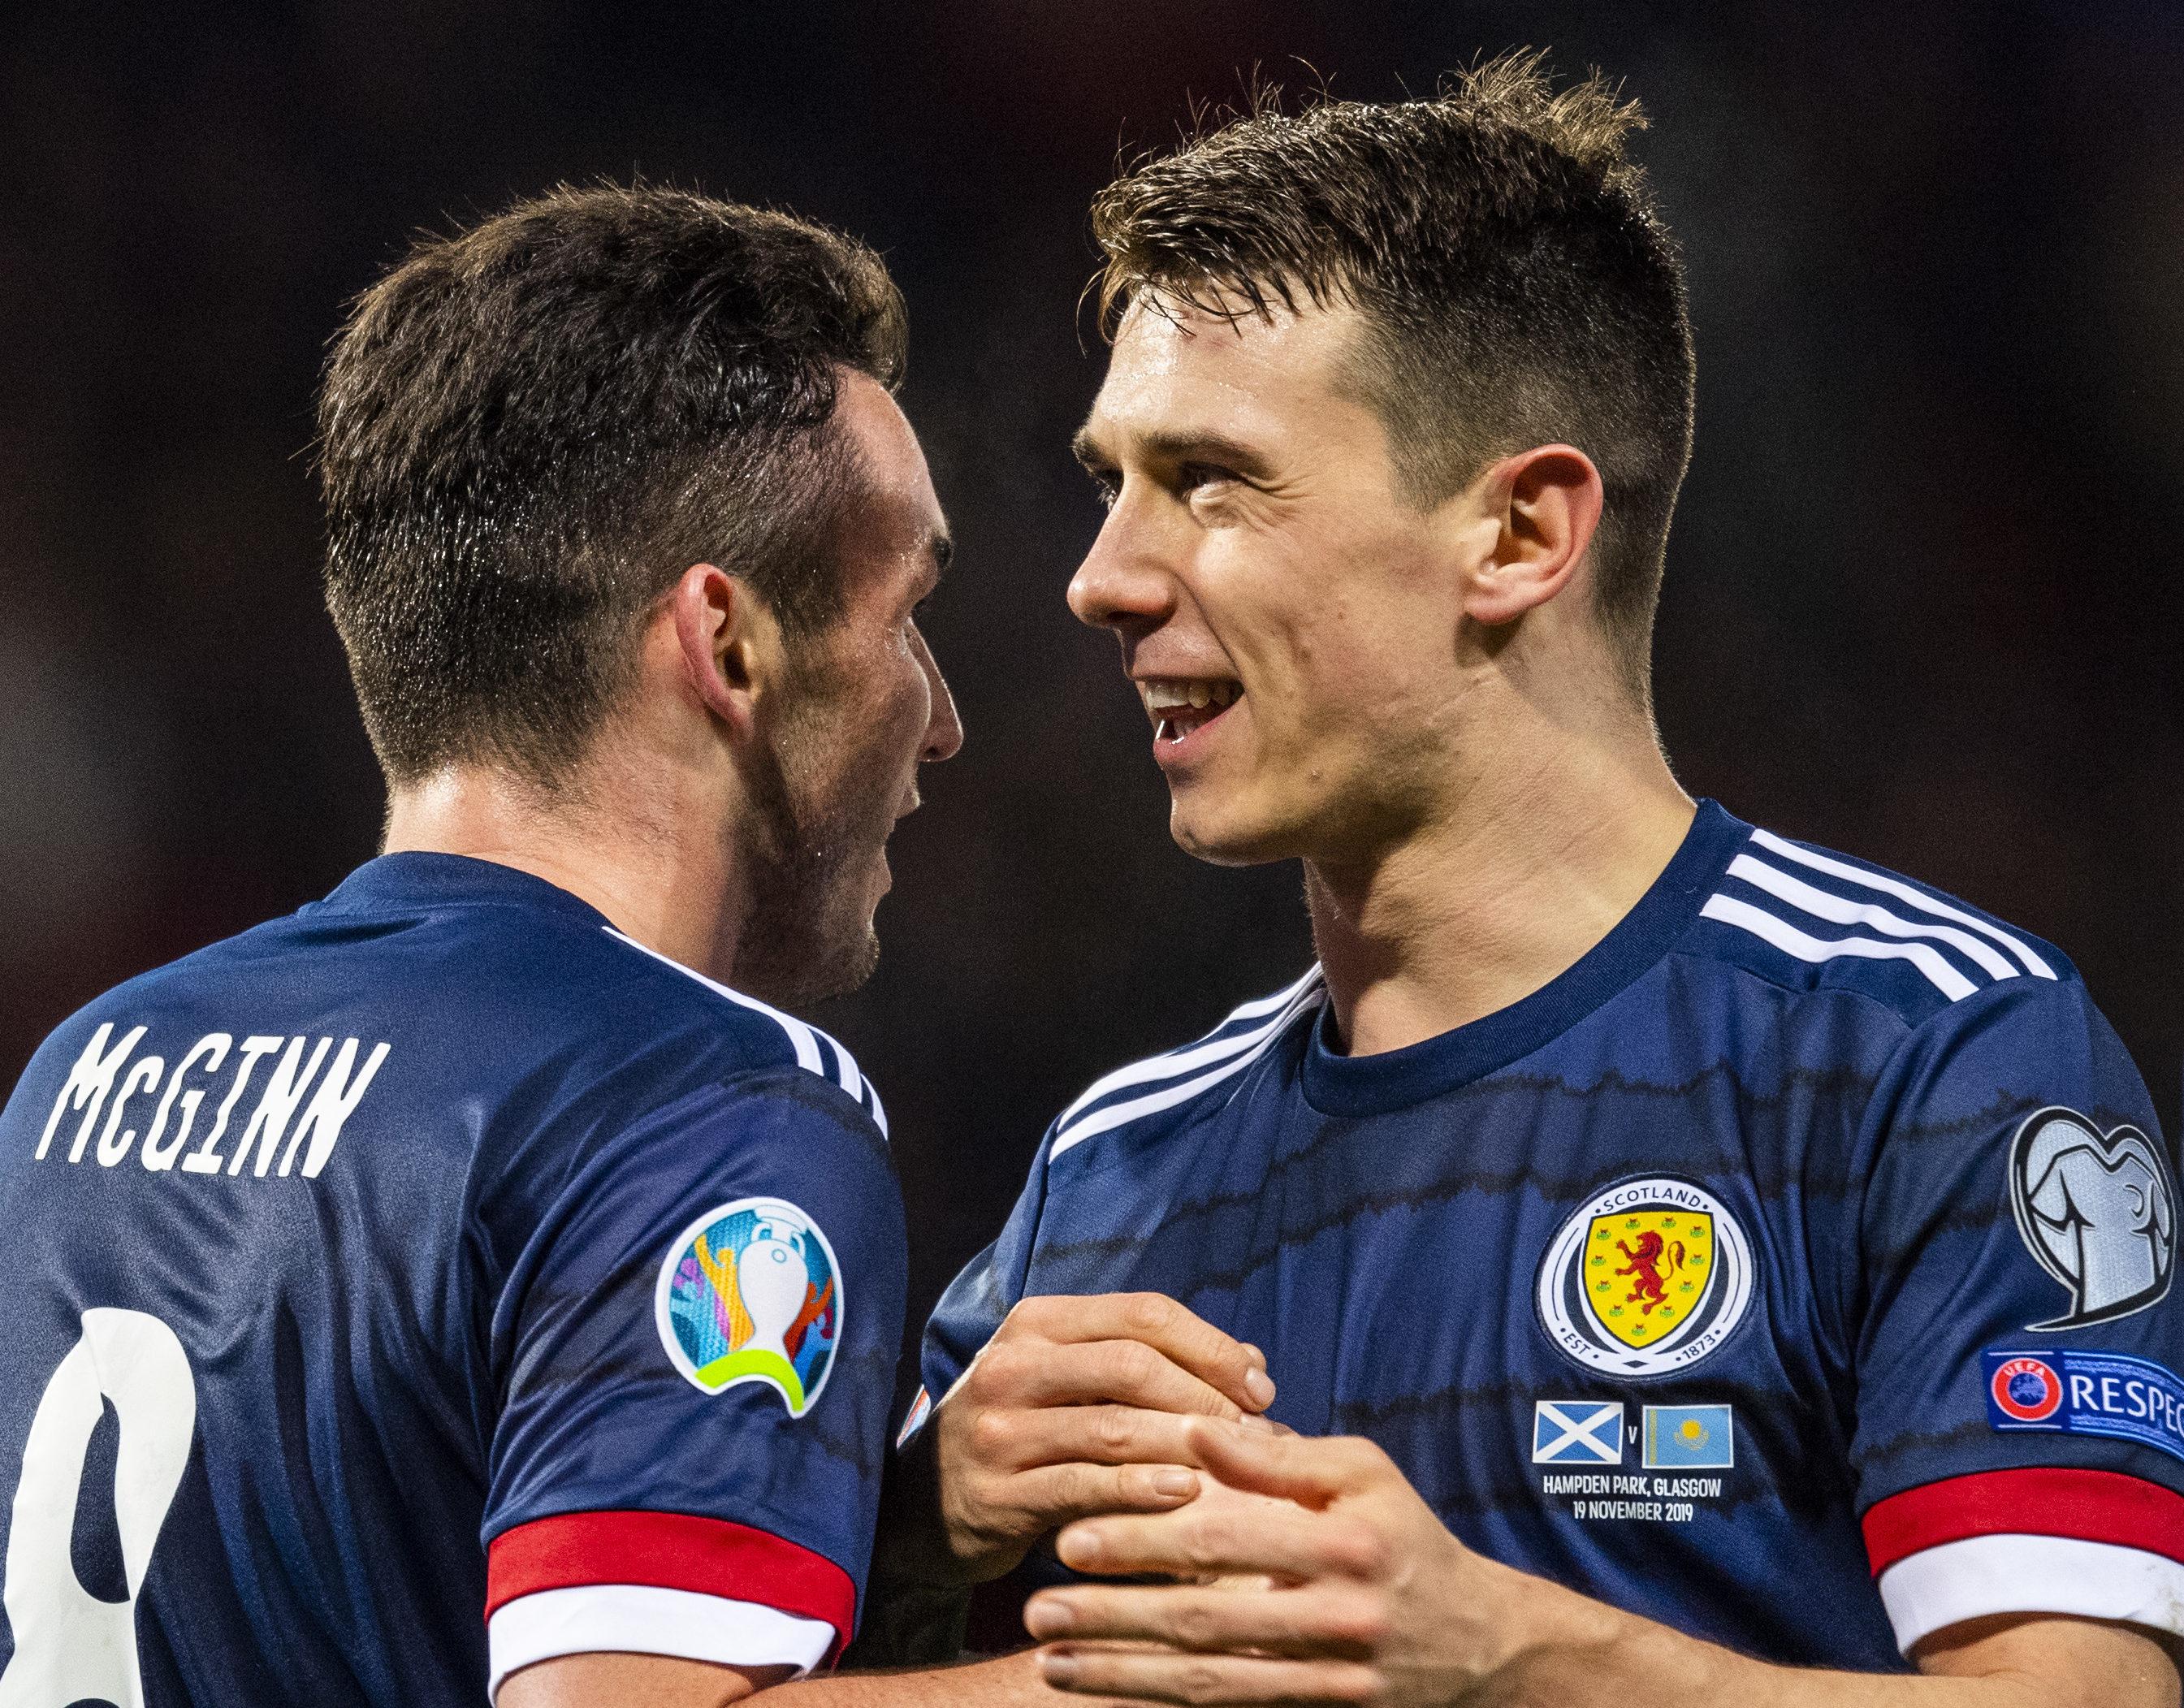 Two of Scotland's excellent midfield, John McGinn and Ryan Jack.